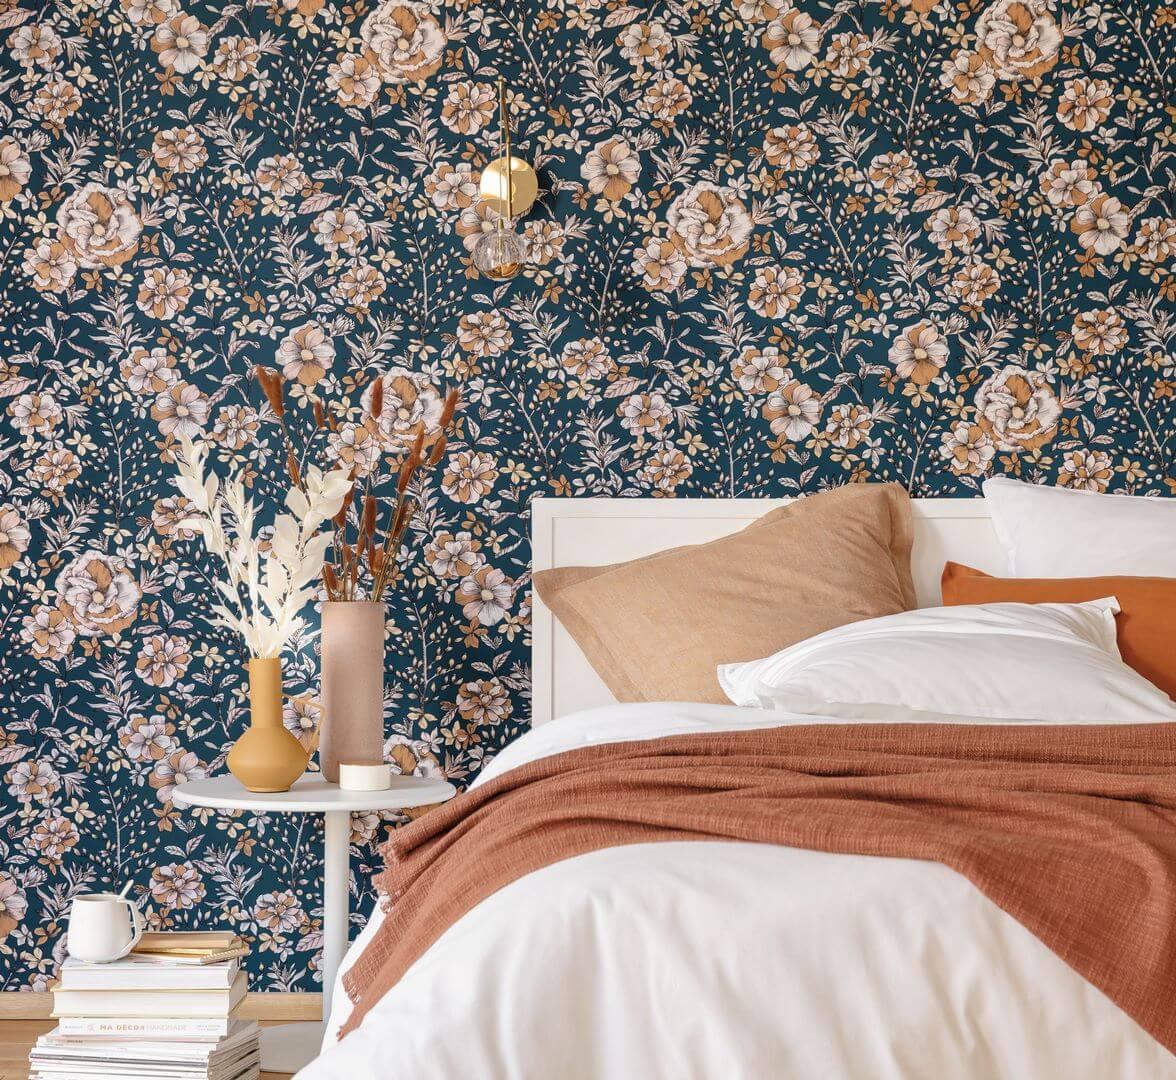 tapeta w kwiaty do sypialni Caselio NGR103066343